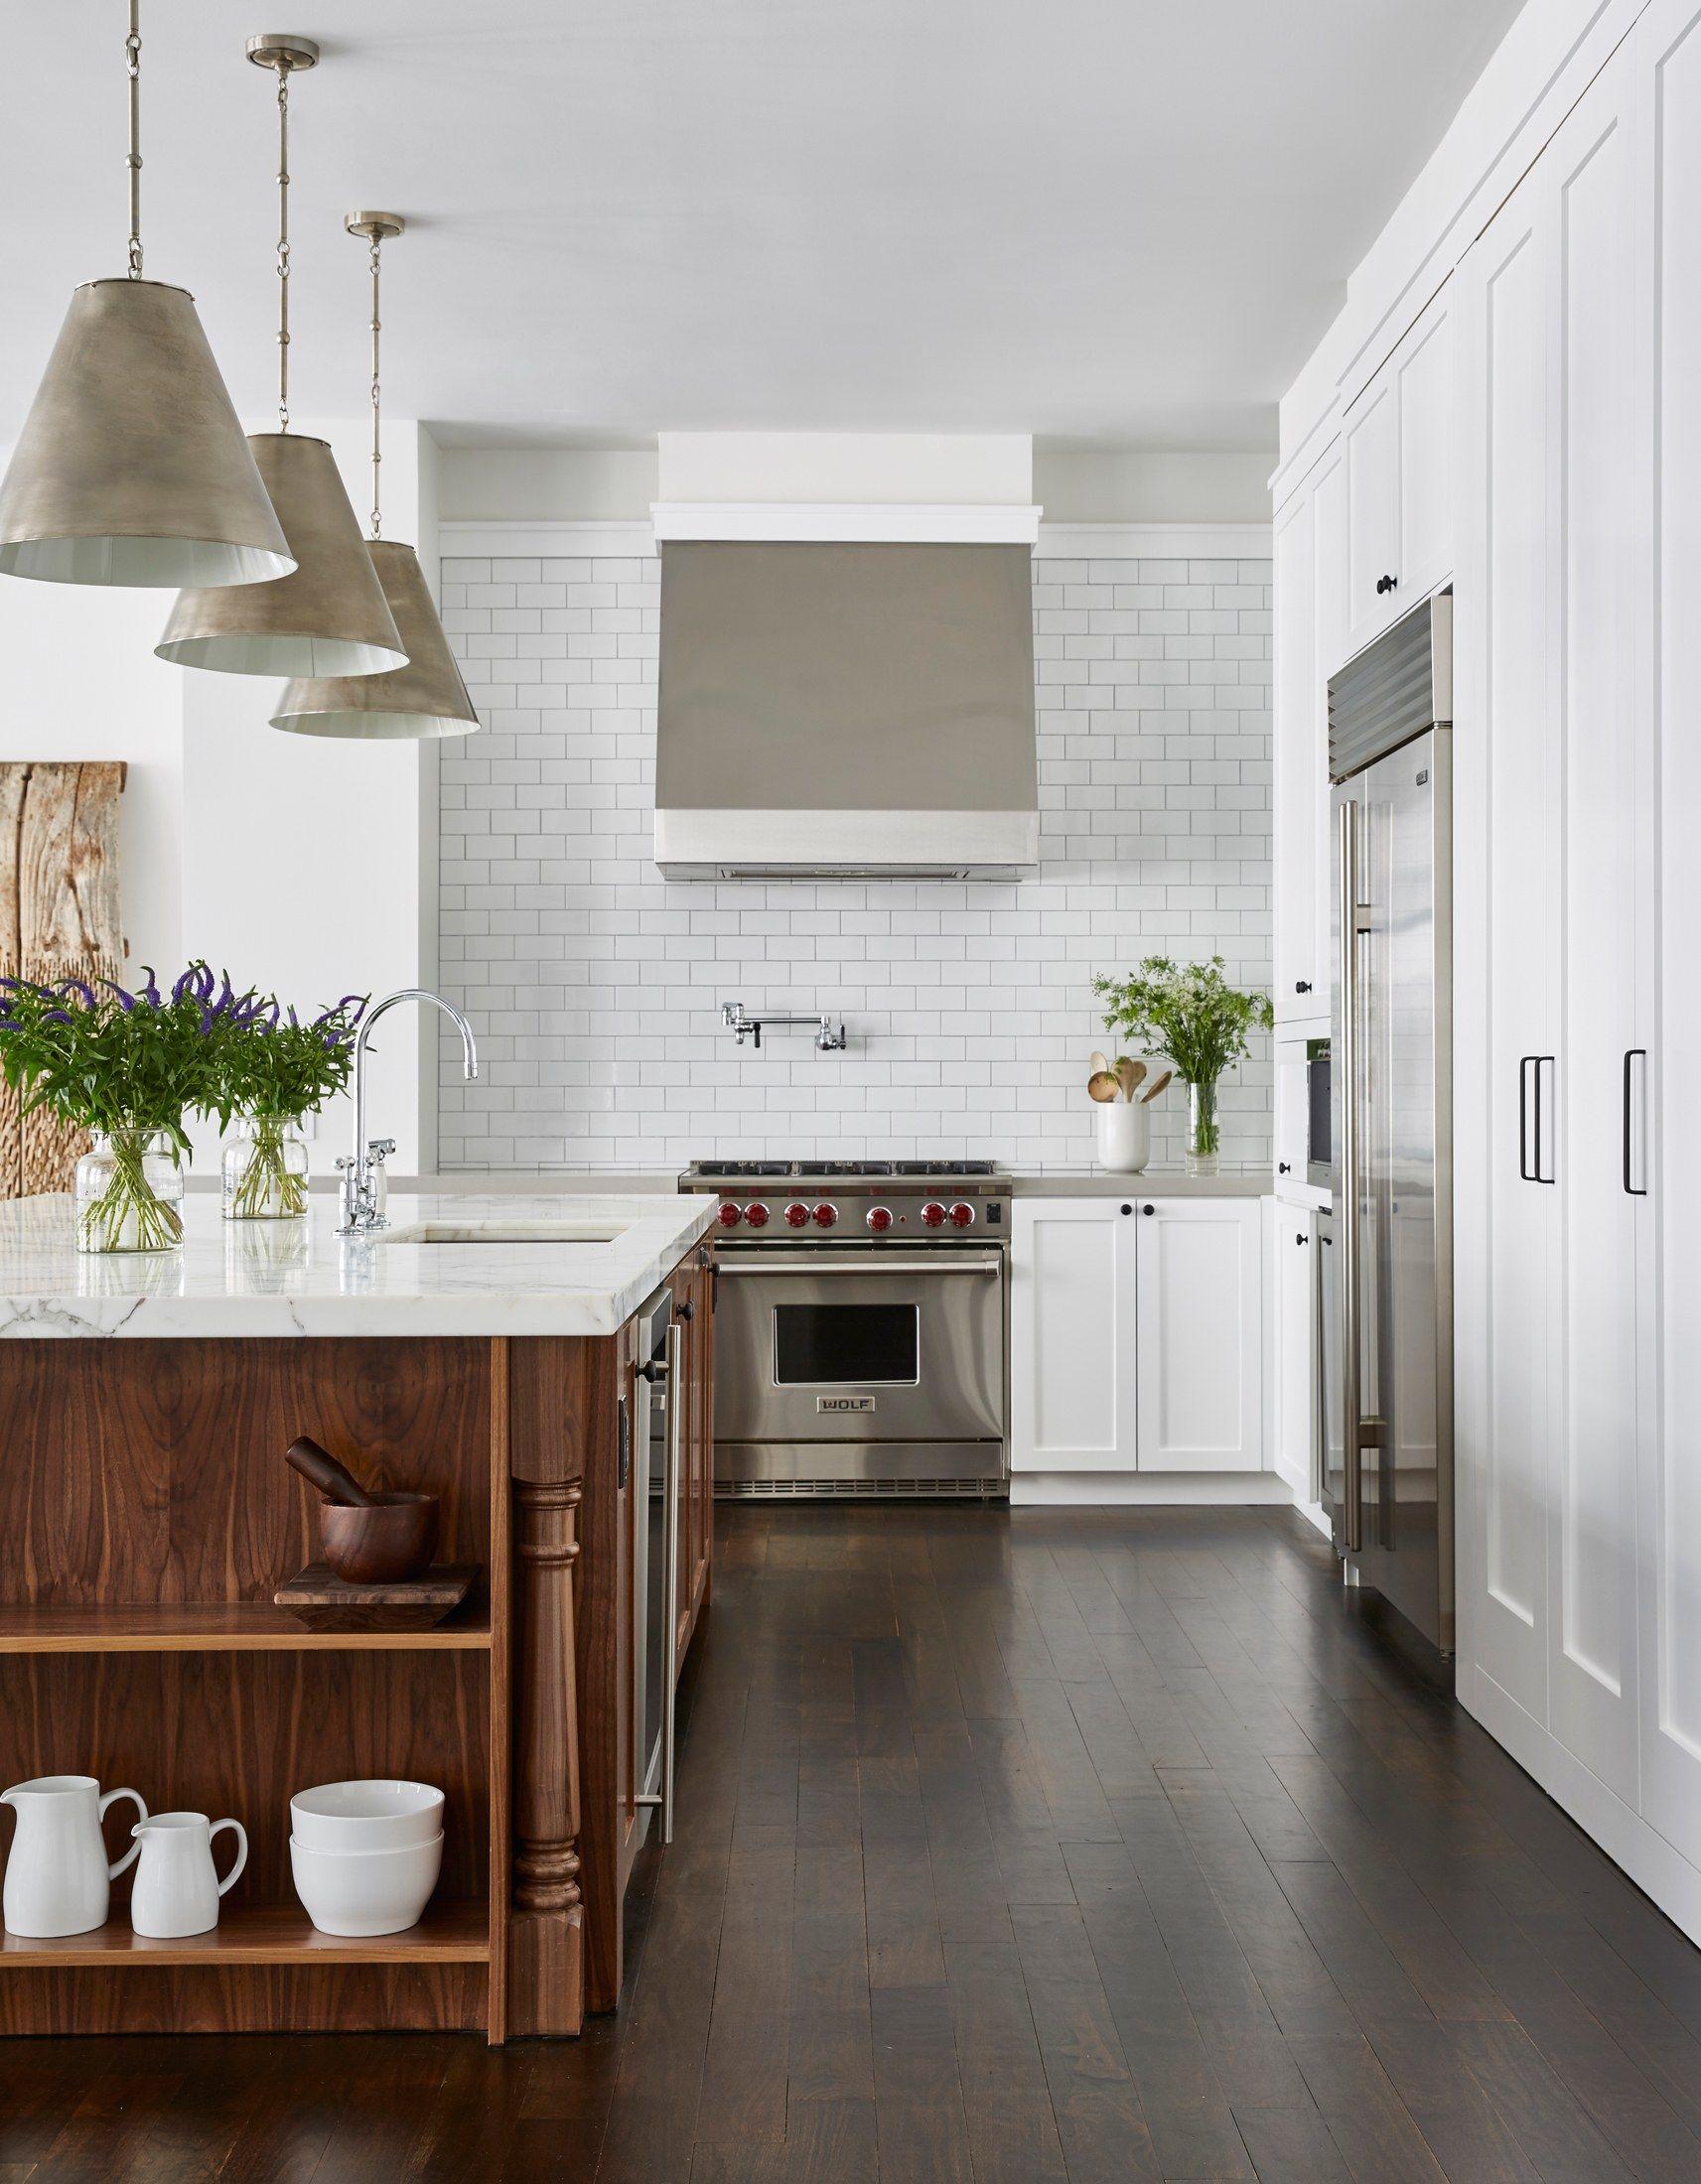 A Modern New York Apartment Awash In Neutral Hues Kitchen Inspiration Design Kitchen Design Trends Modern Kitchen Design